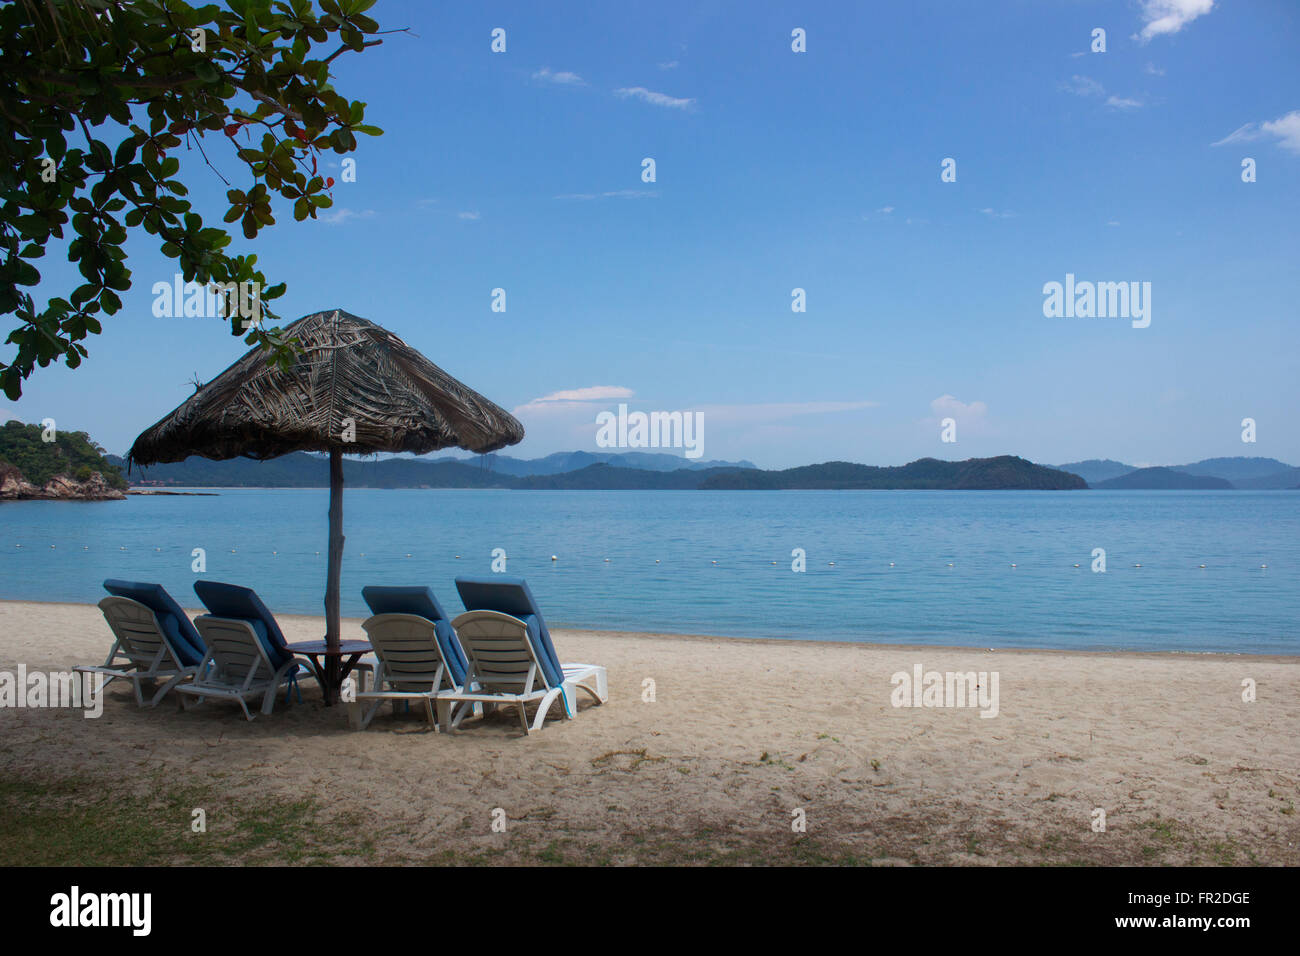 Taj Vivanta Rebak Island Langkawi resort in one of the most beautiful resorts in South East Asia. Laze on the beach - Stock Image